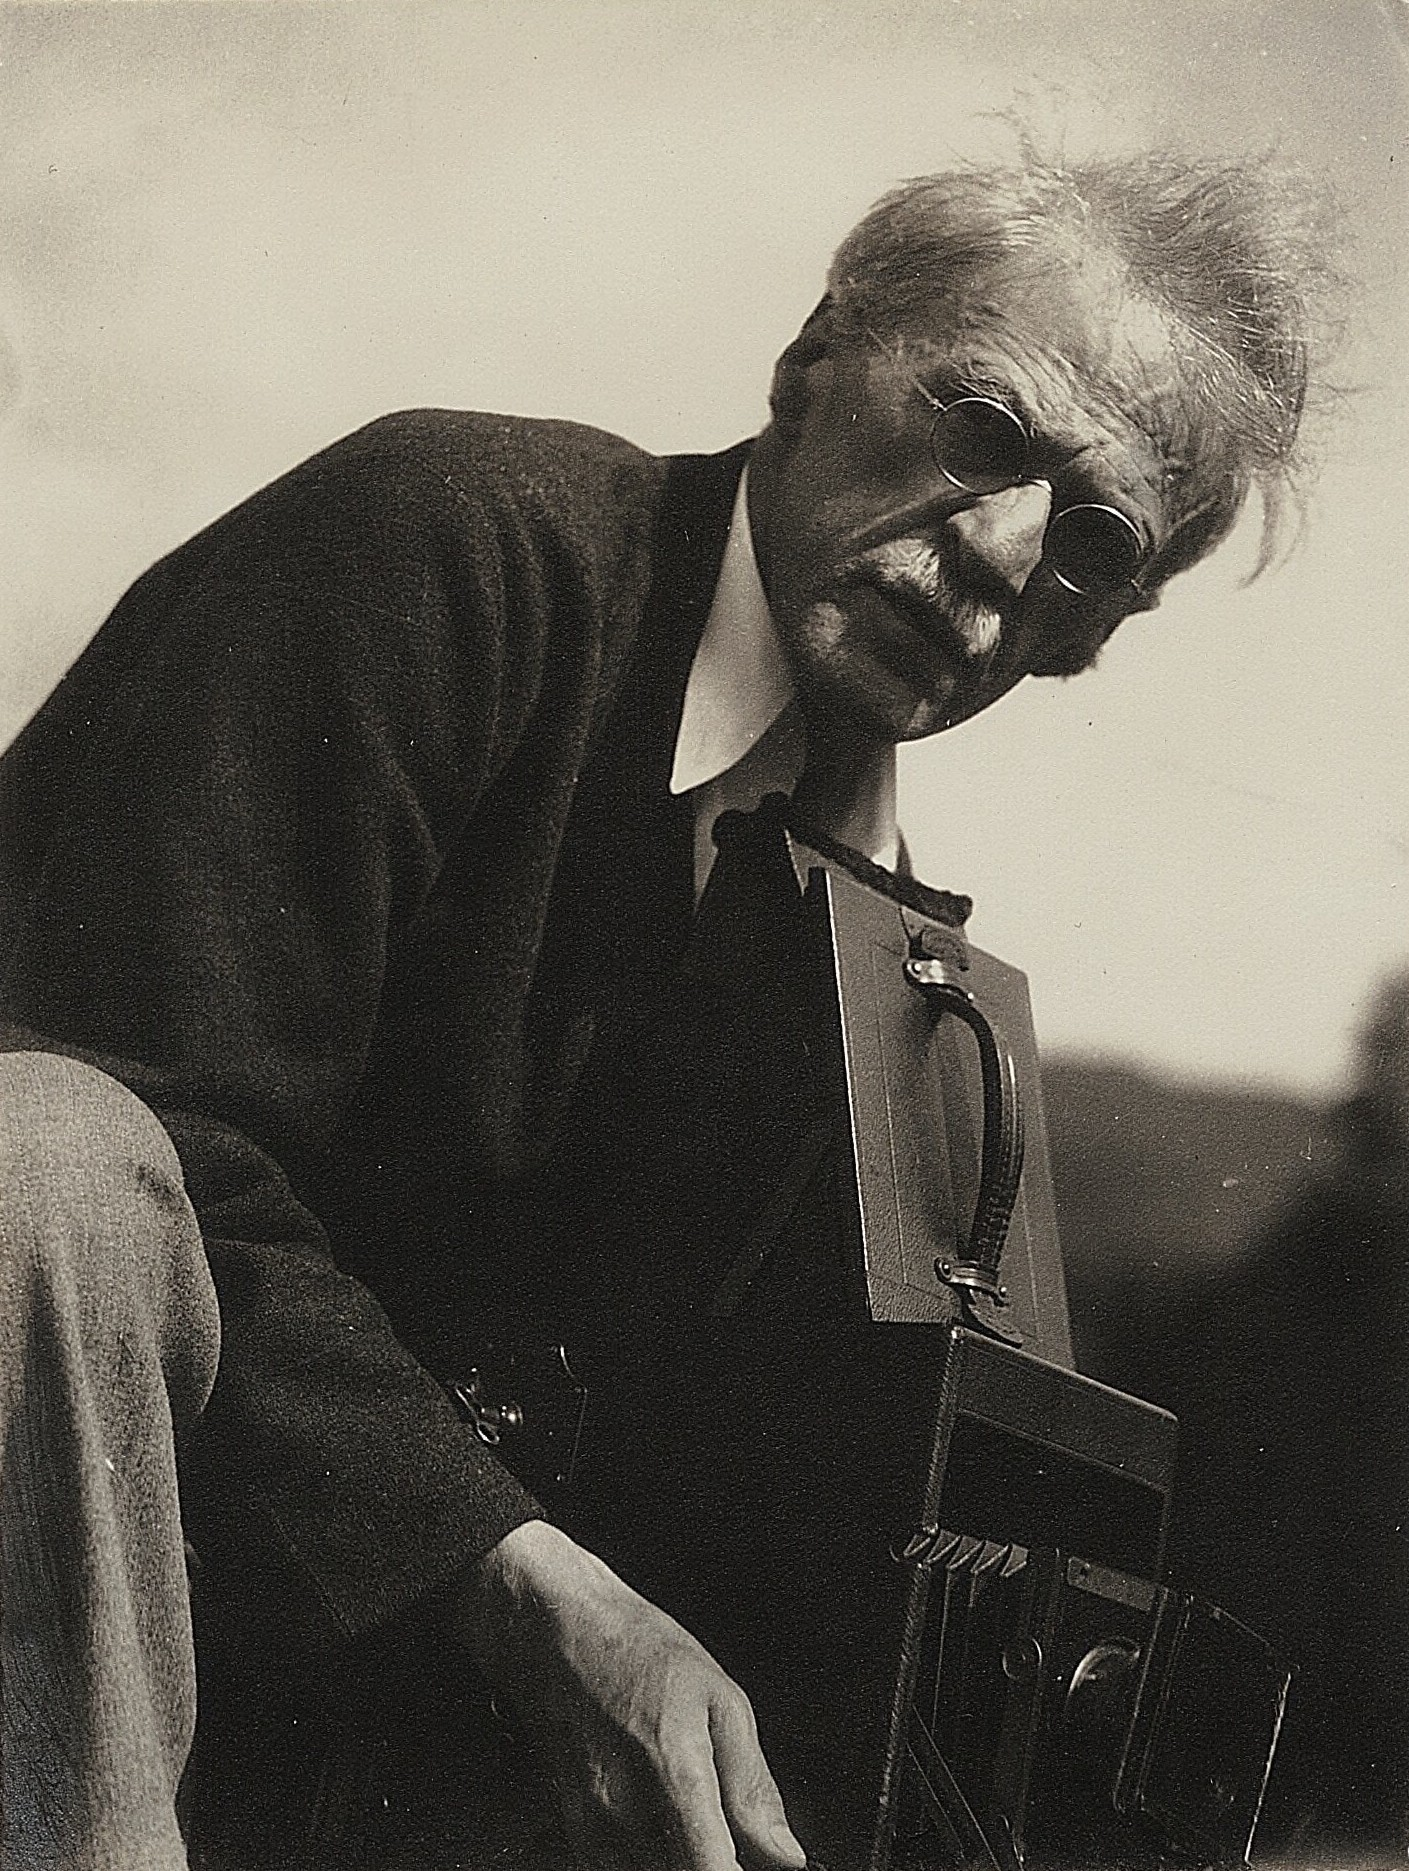 Jordans Photography Blog: Alfred Stieglitz